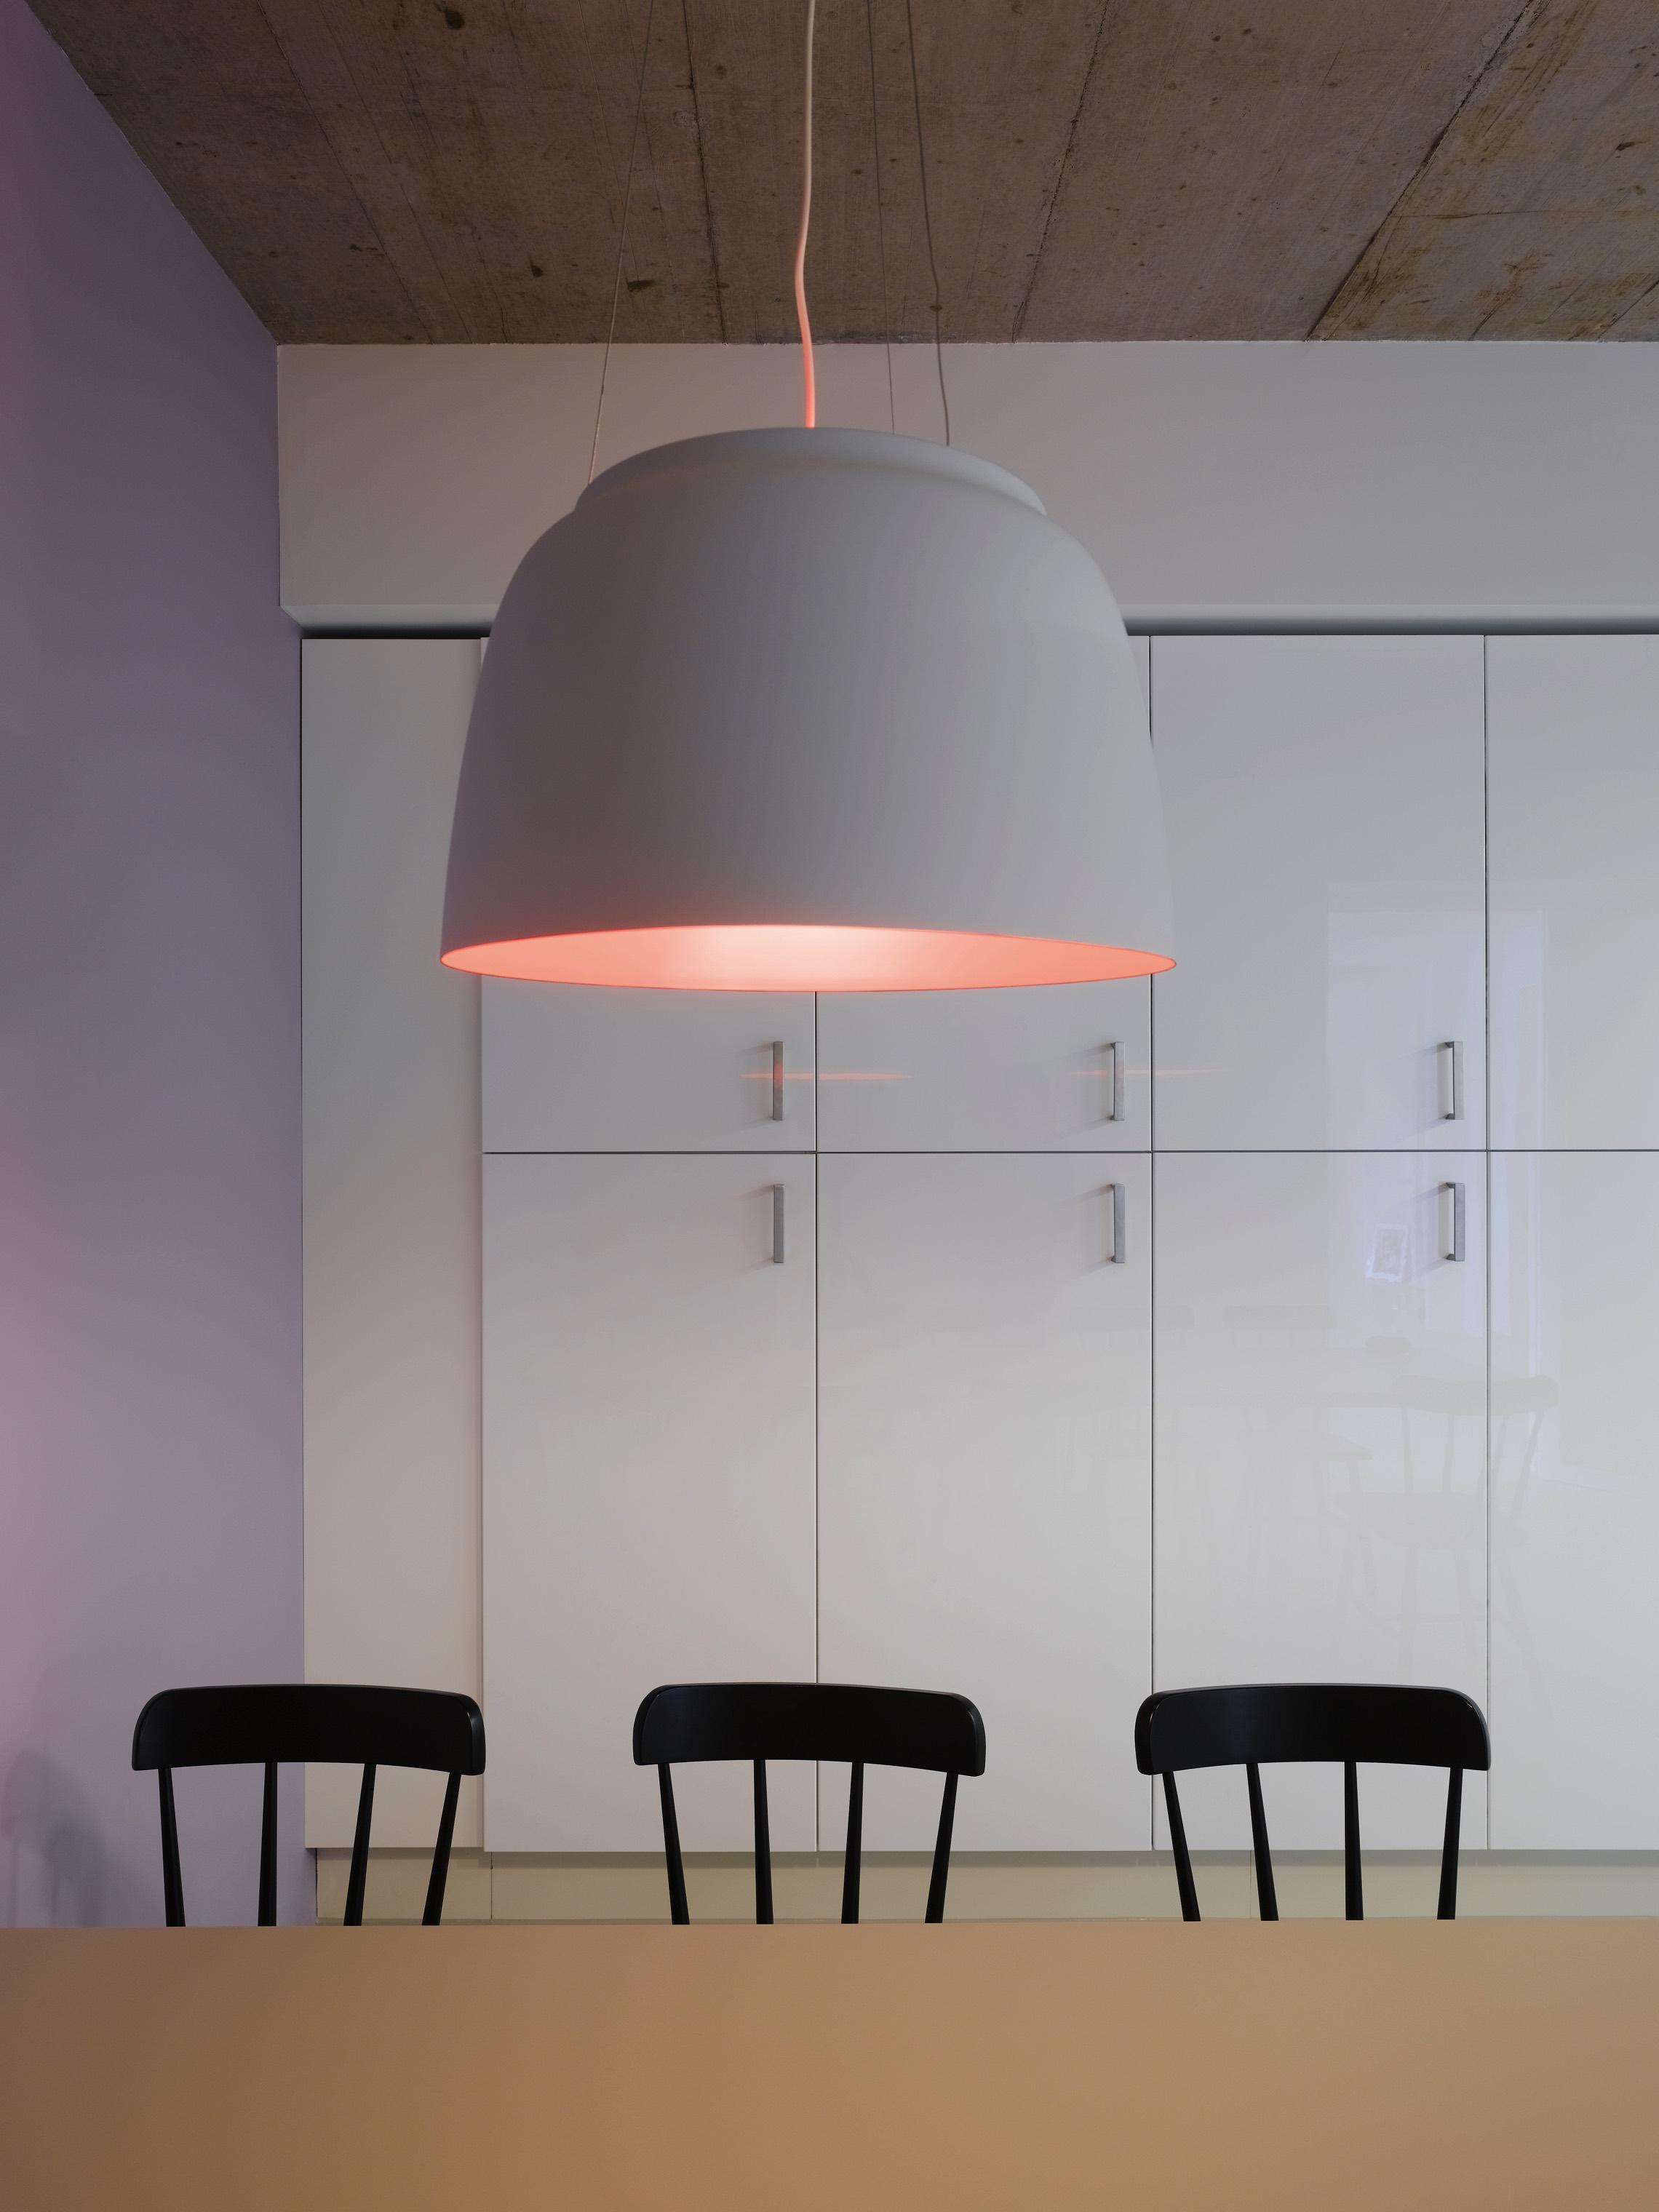 agentur bruce b emmy b stuttgart office inspiration. Black Bedroom Furniture Sets. Home Design Ideas